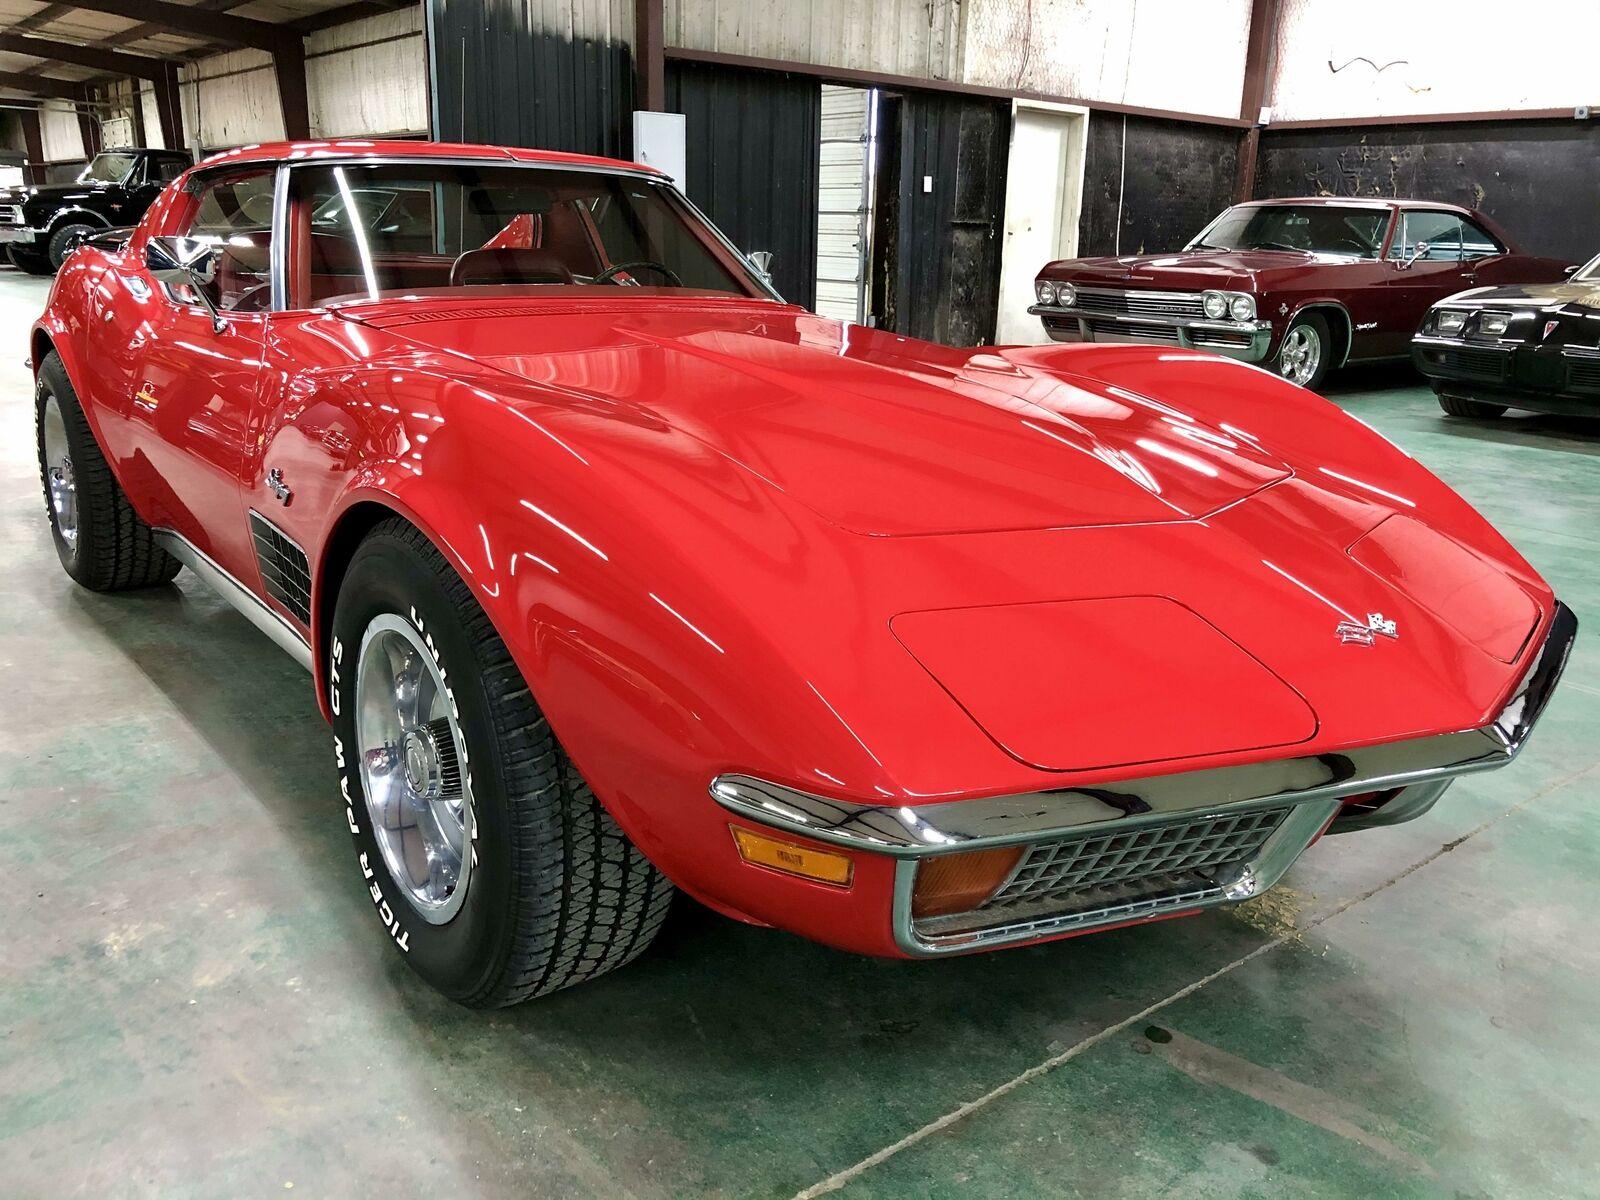 1972 Red Chevrolet Corvette     C3 Corvette Photo 7